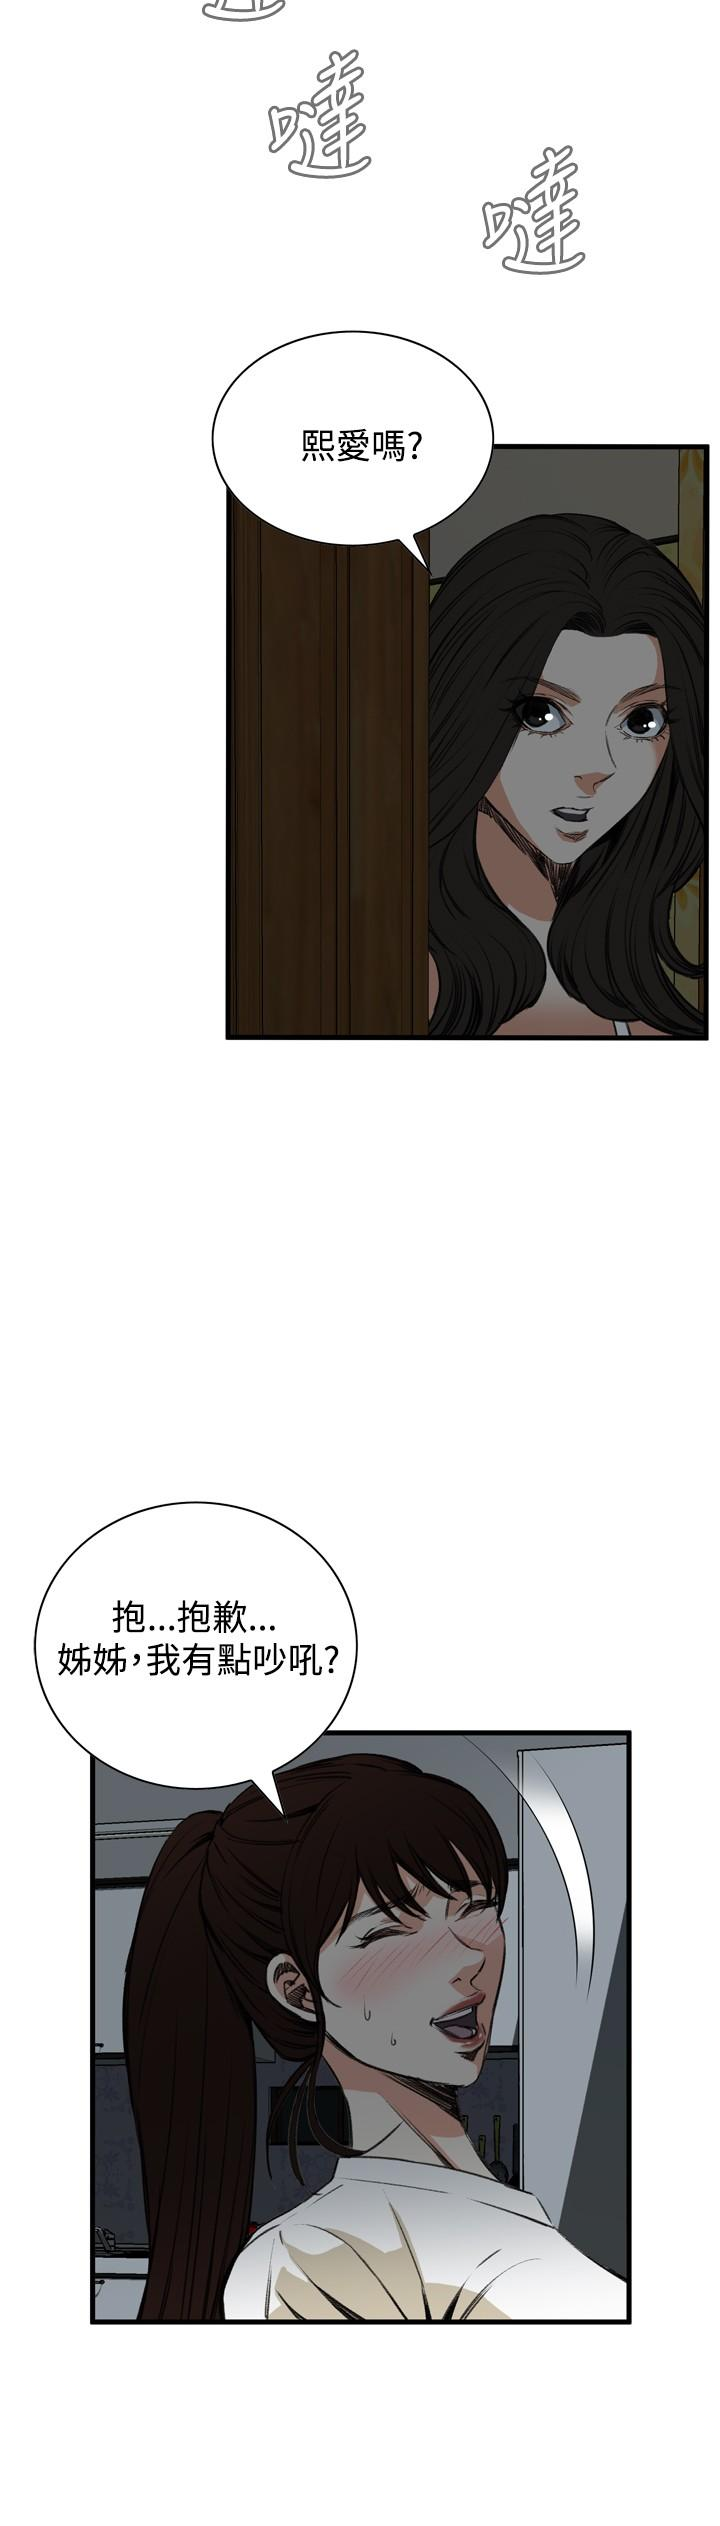 Take a Peek 偷窥 Ch.39~60 [Chinese]中文 183